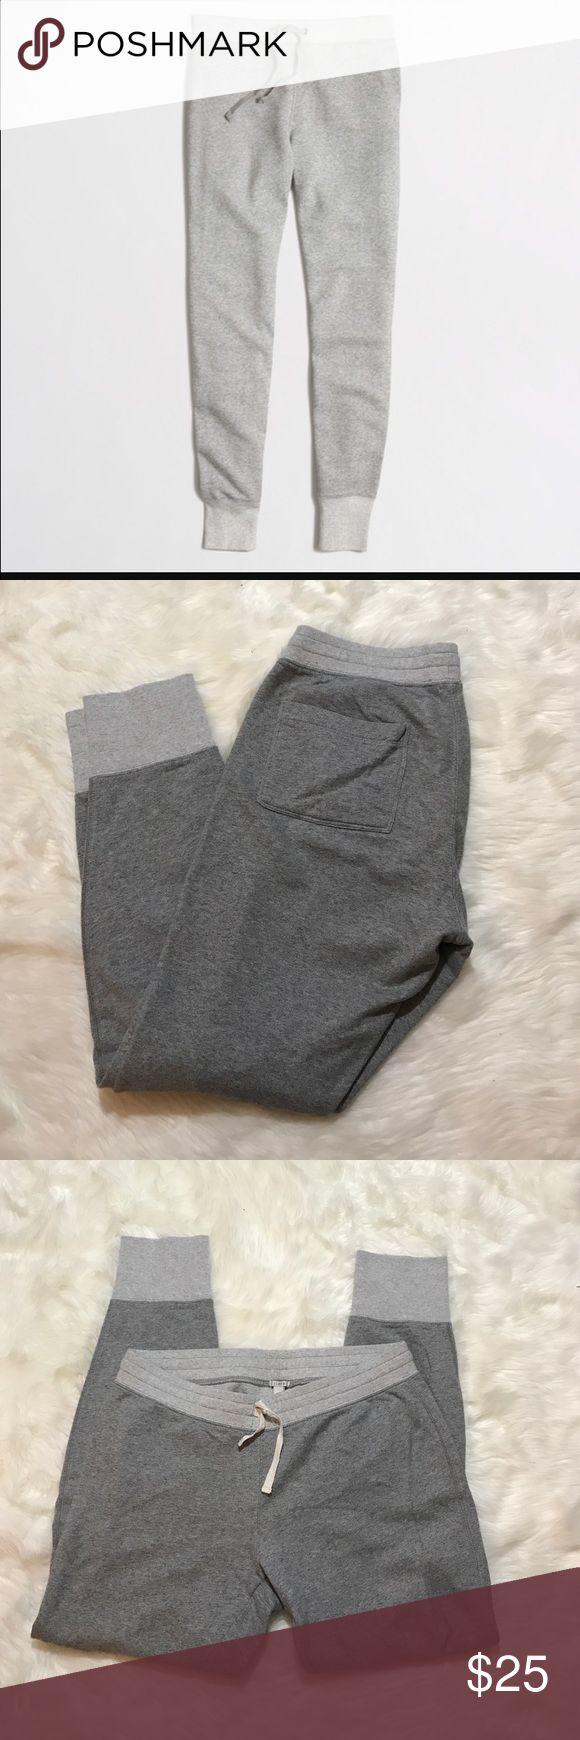 J. Crew gray jogger sweatpants J. Crew gray joggers pants size medium J. Crew Pants Track Pants & Joggers